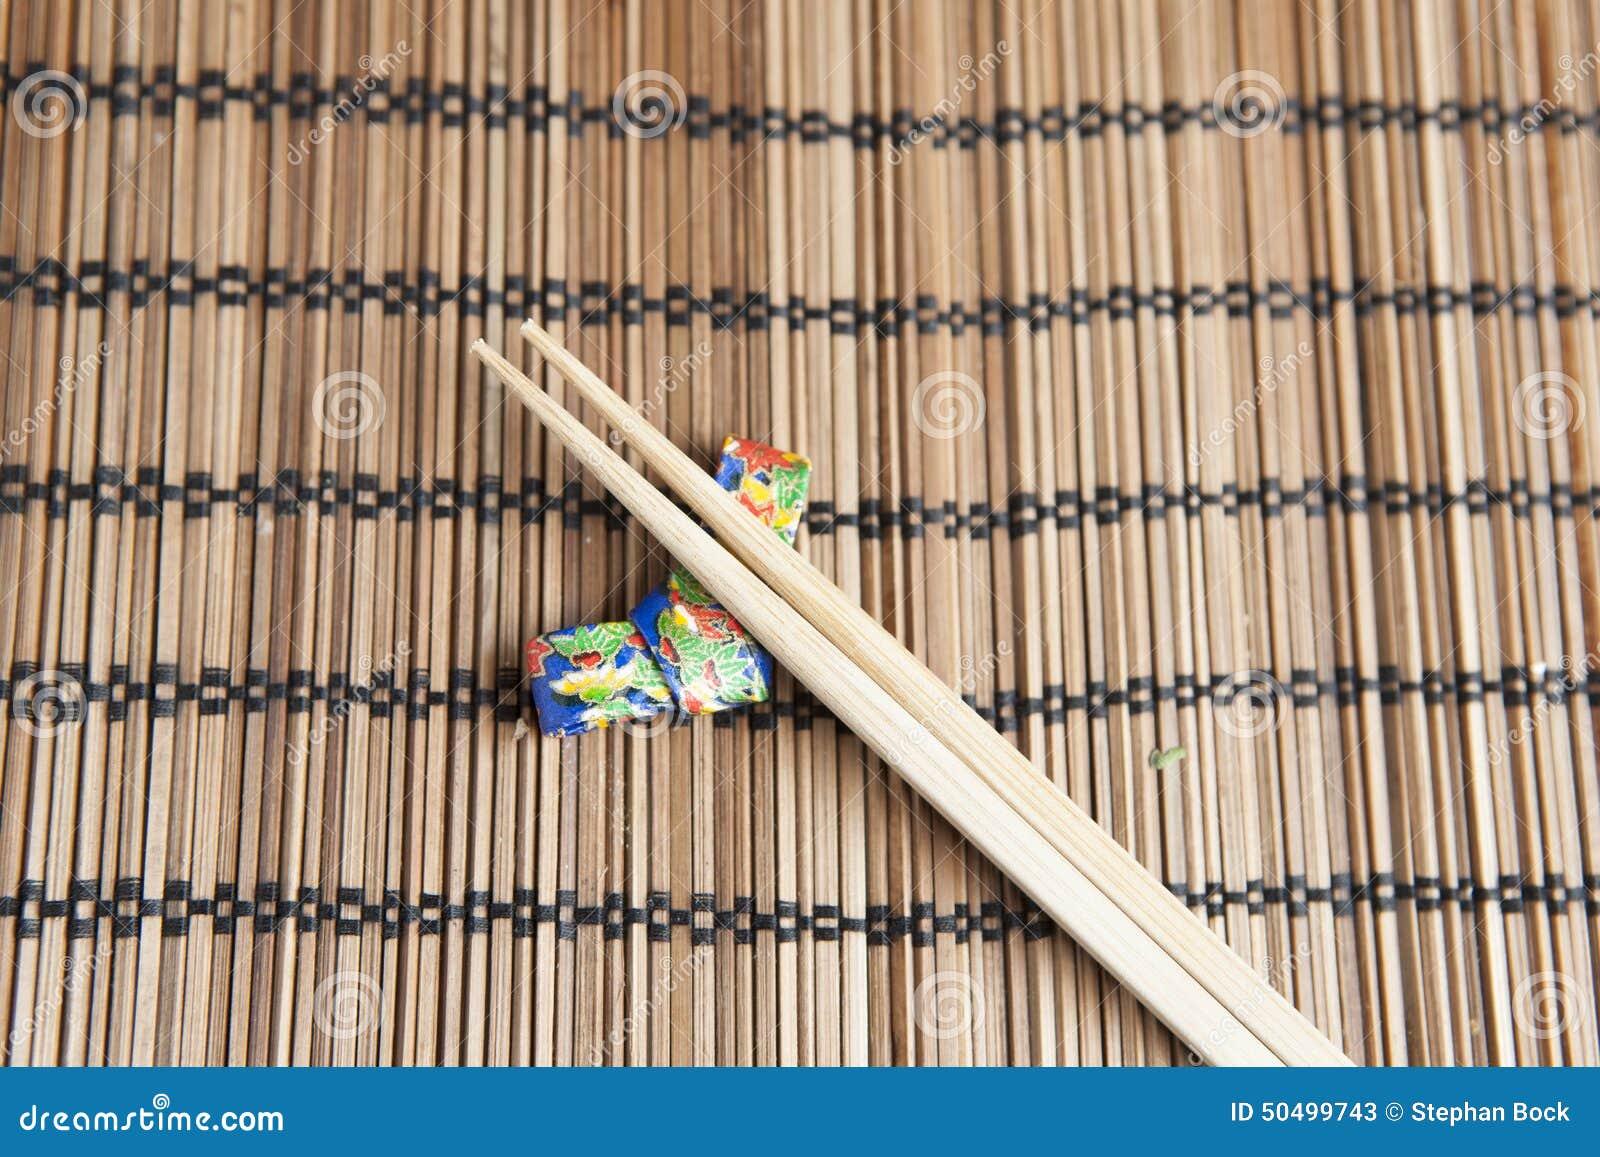 Bamboo Chopsticks On A Handmade Origami Chopstick Holder Stock Image